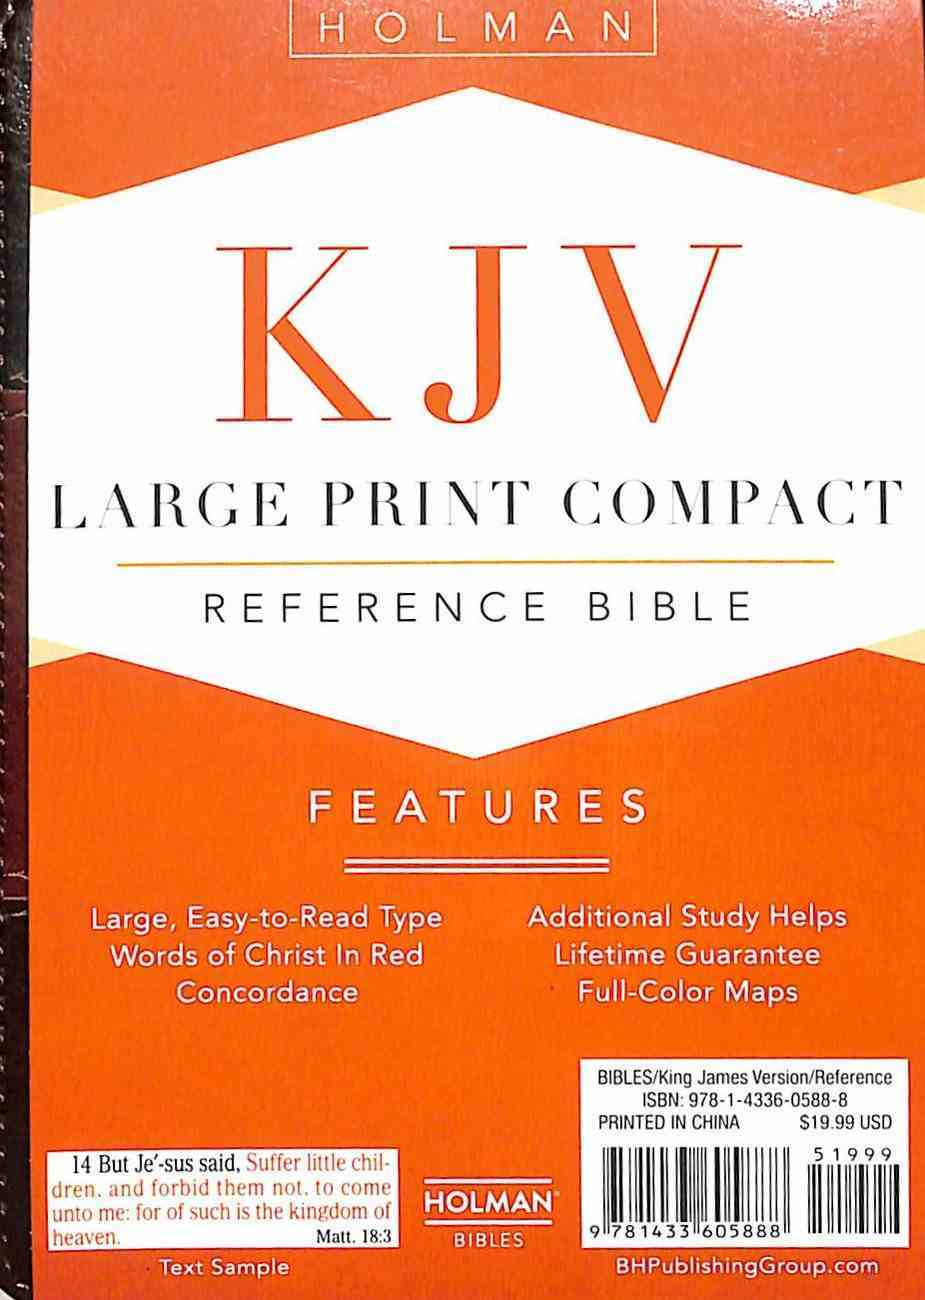 KJV Large Print Compact Reference Bible Saddle Brown Premium Imitation Leather